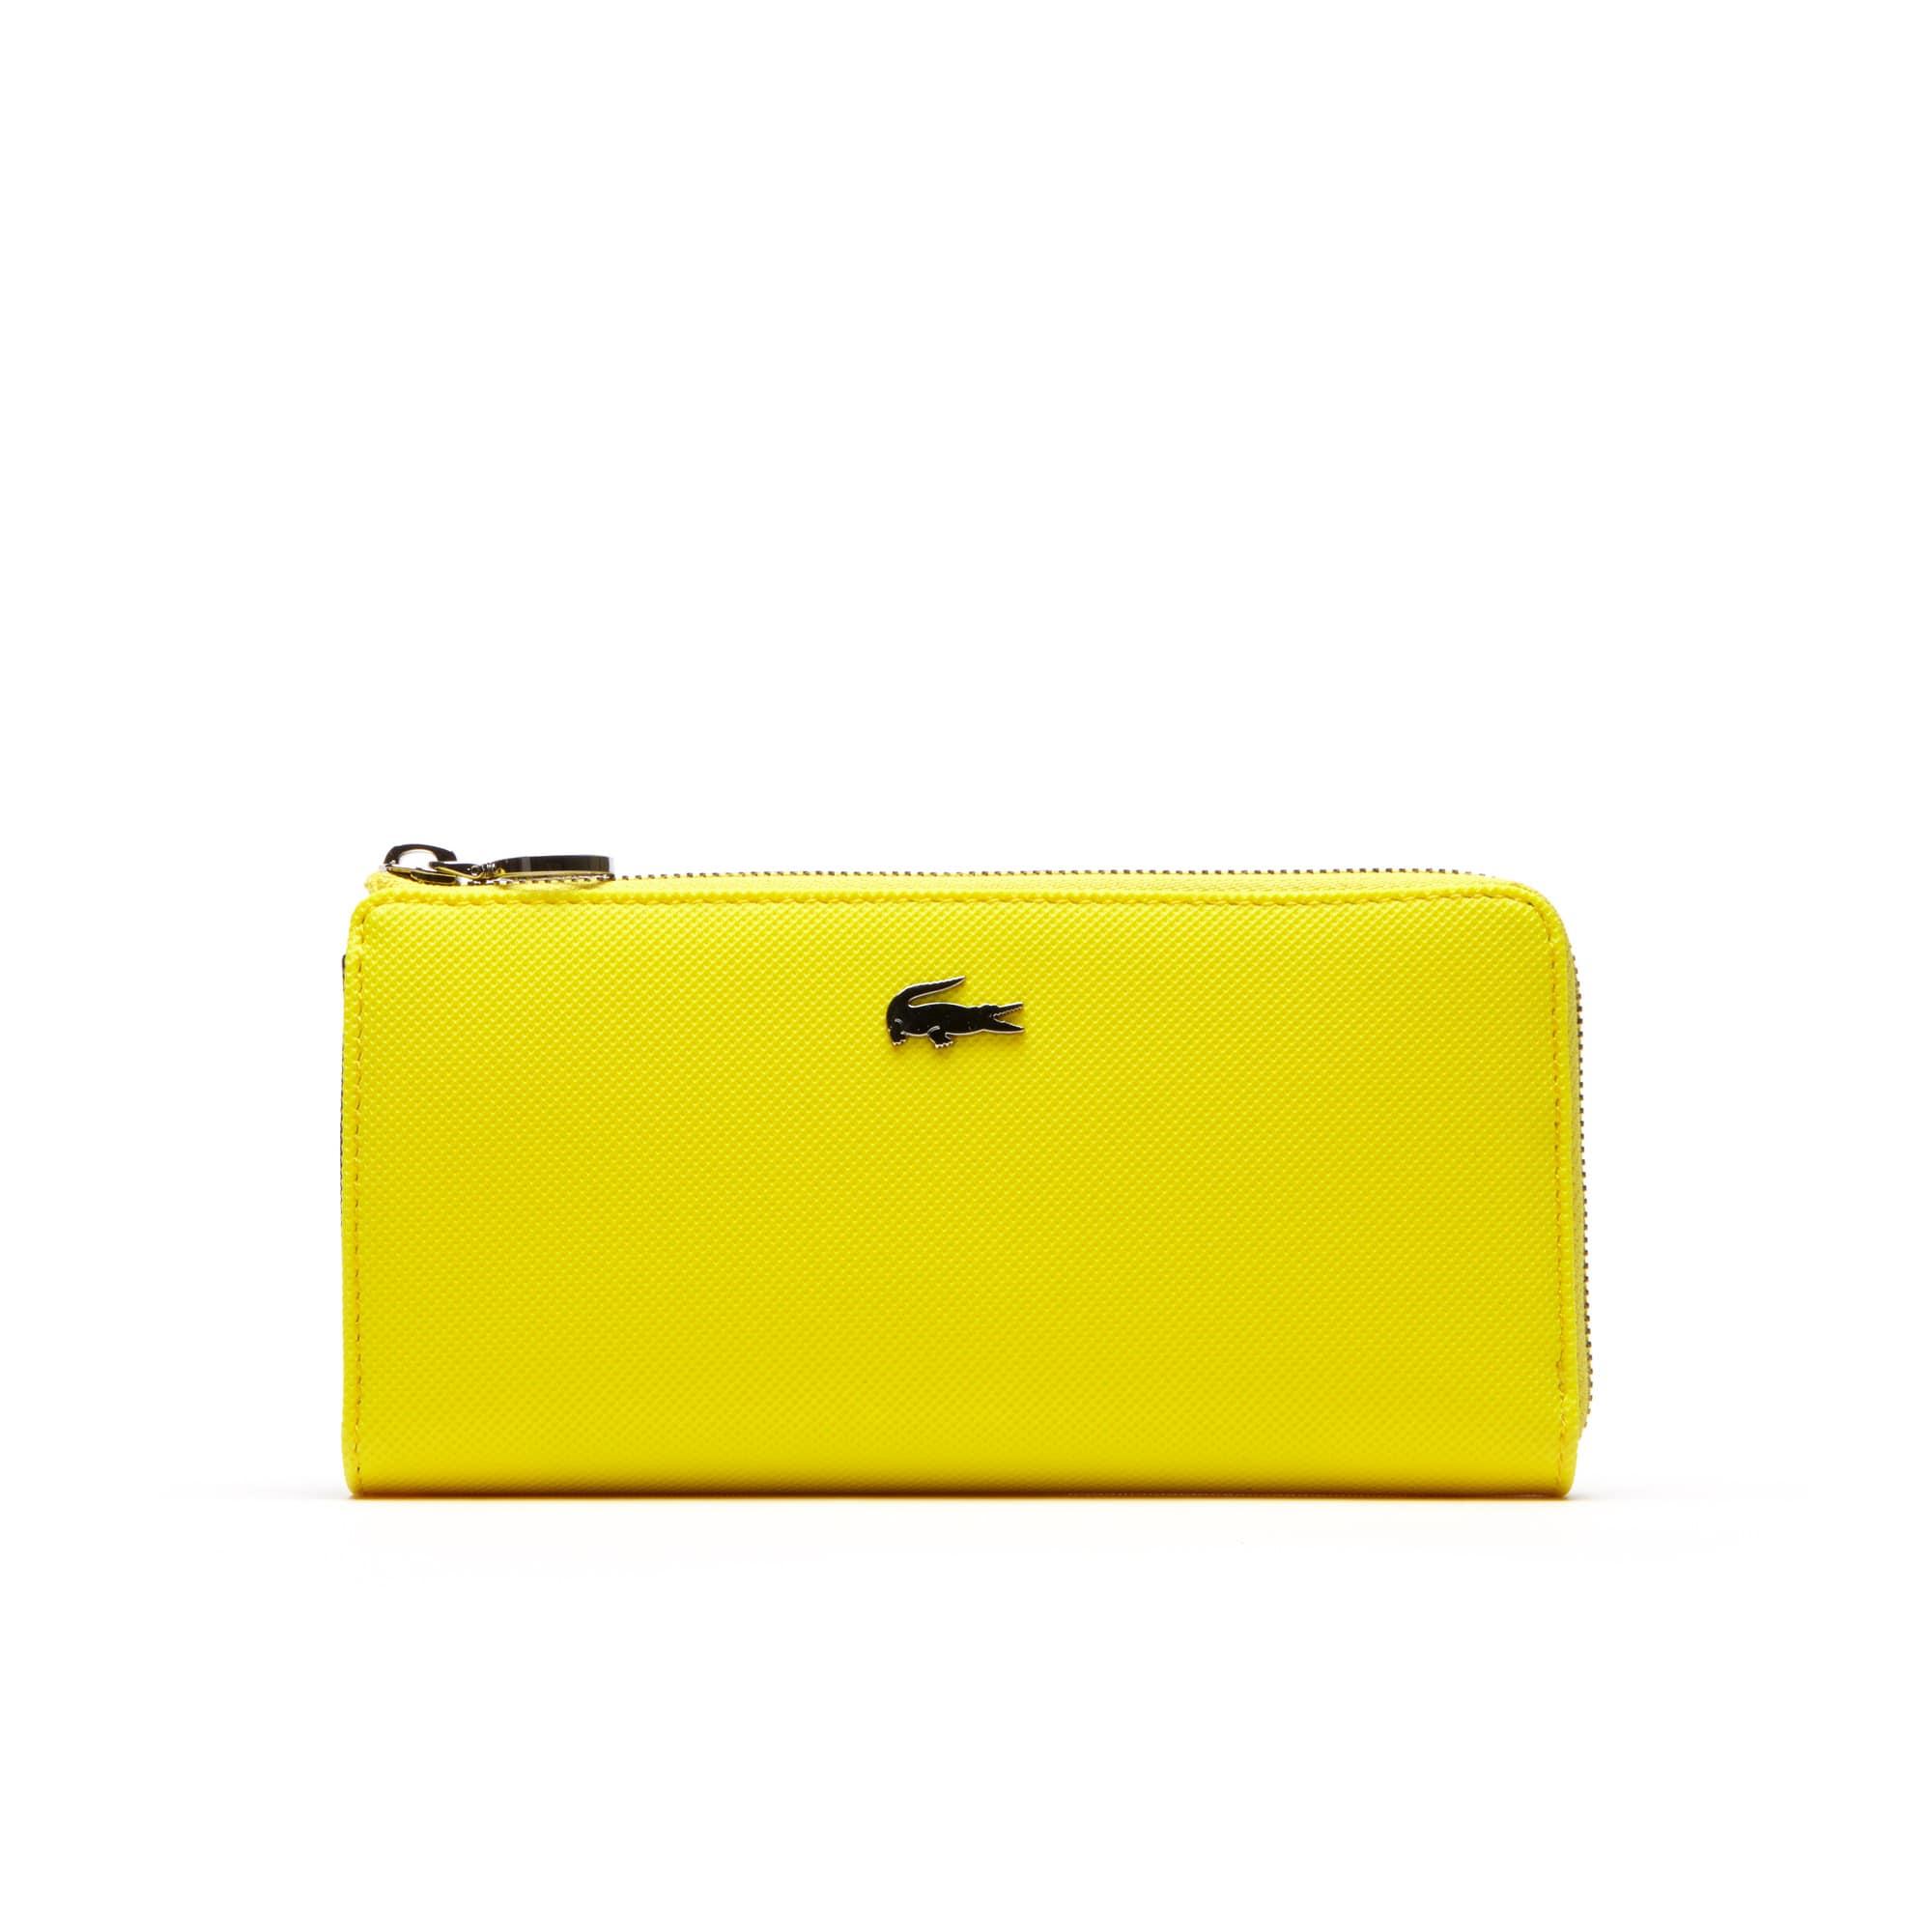 Women's Daily Classic Fine Piqué Grains Zip Wallet